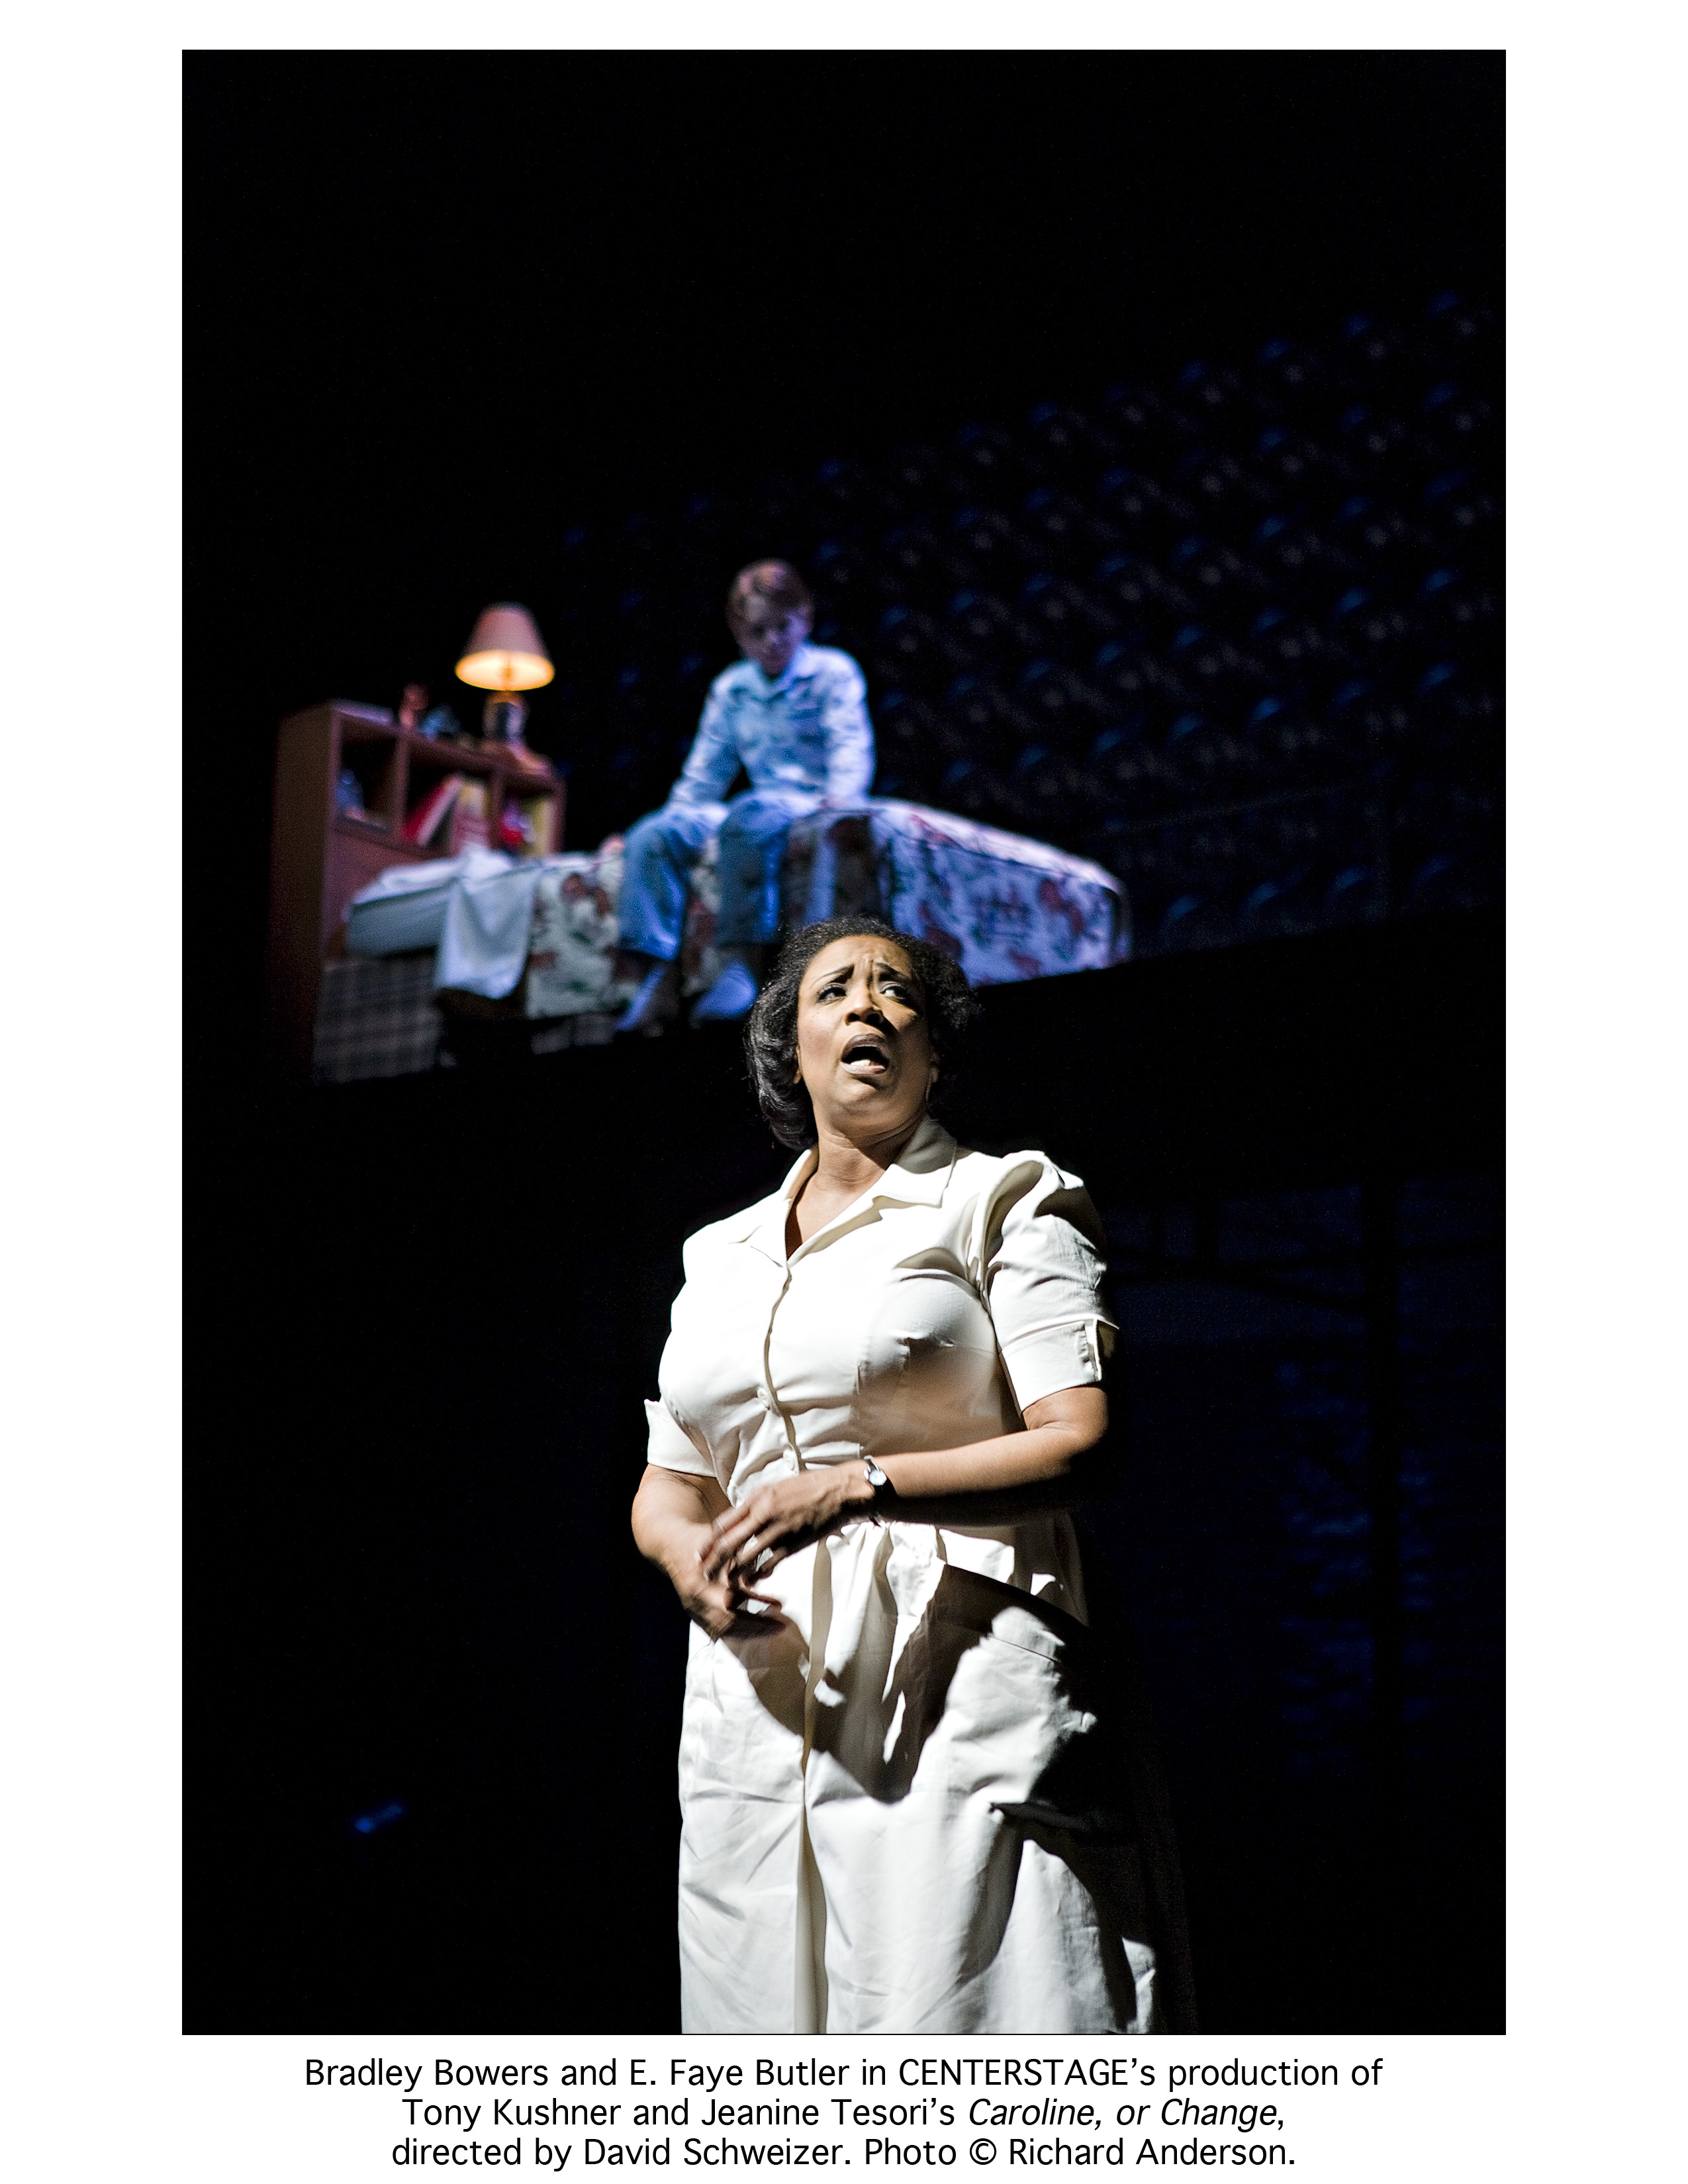 Challenging Musical 'Caroline, Or Change' At Center Stage